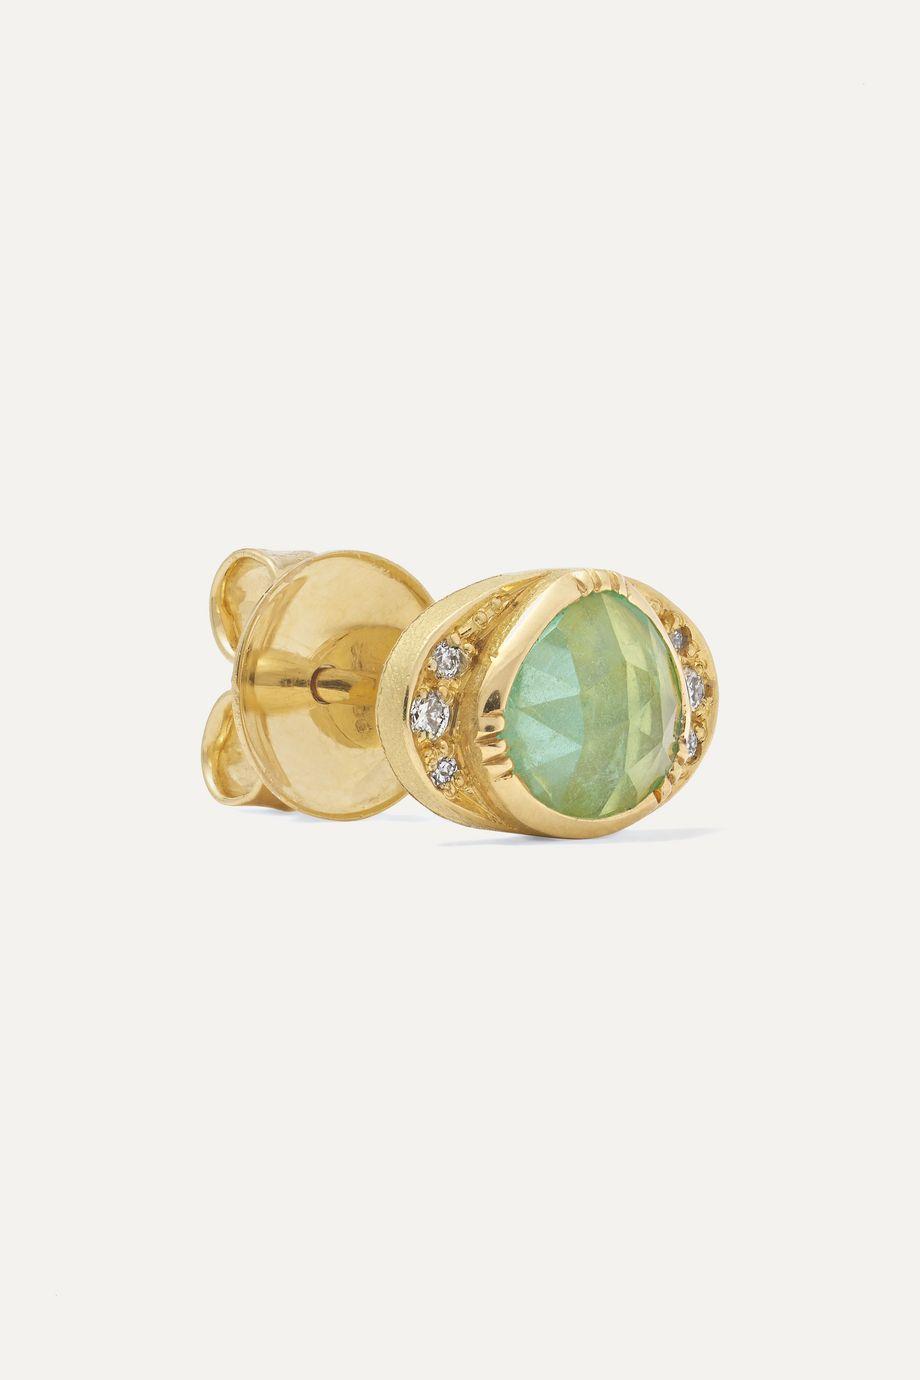 Brooke Gregson Halo 18-karat gold, emerald and diamond earrings